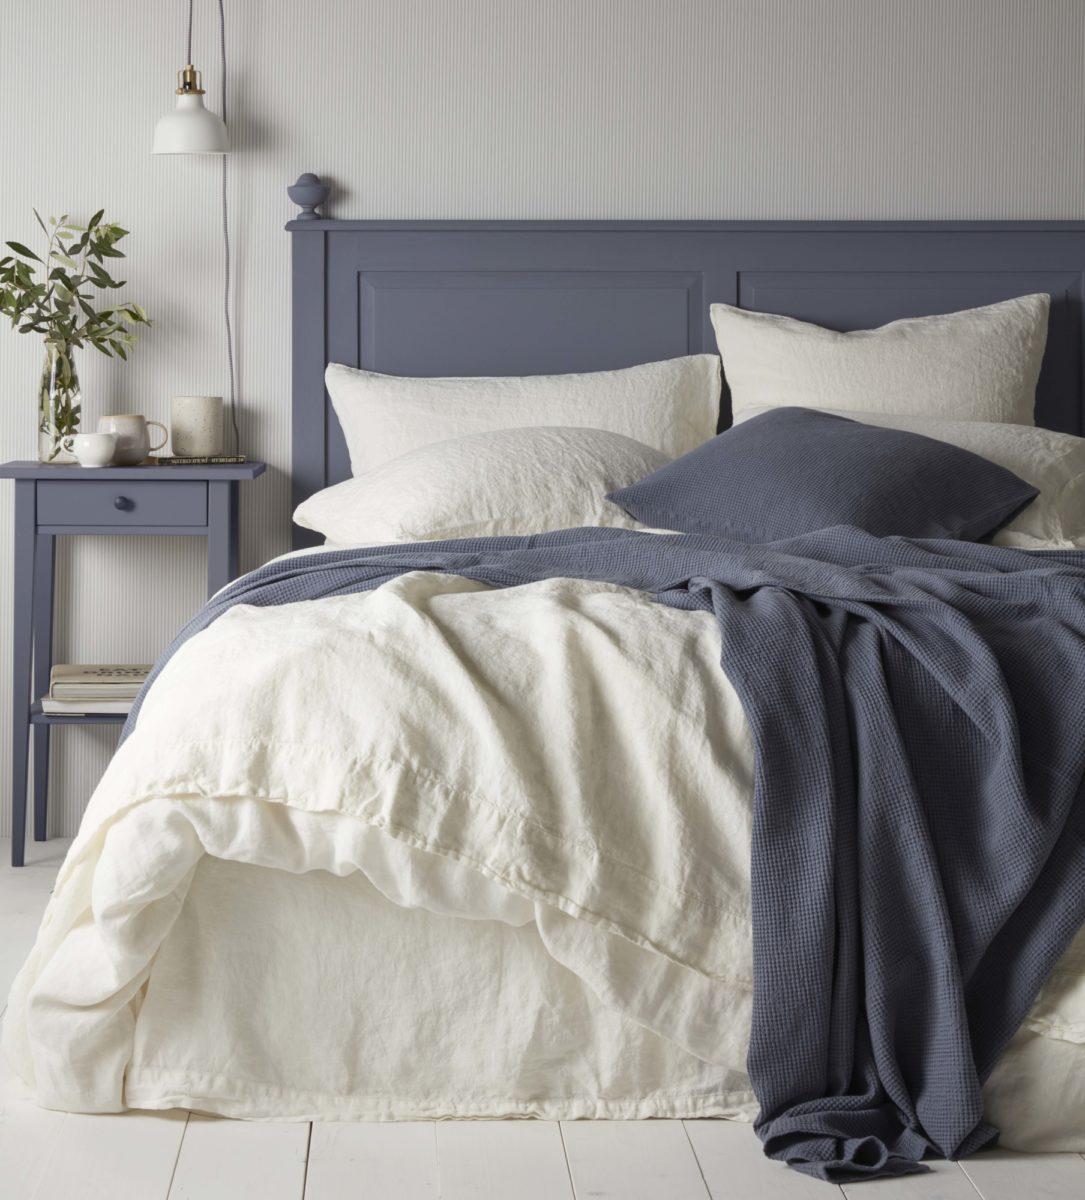 100 Linen Cream Duvet Cover Natural Bedding Secret Linen Store